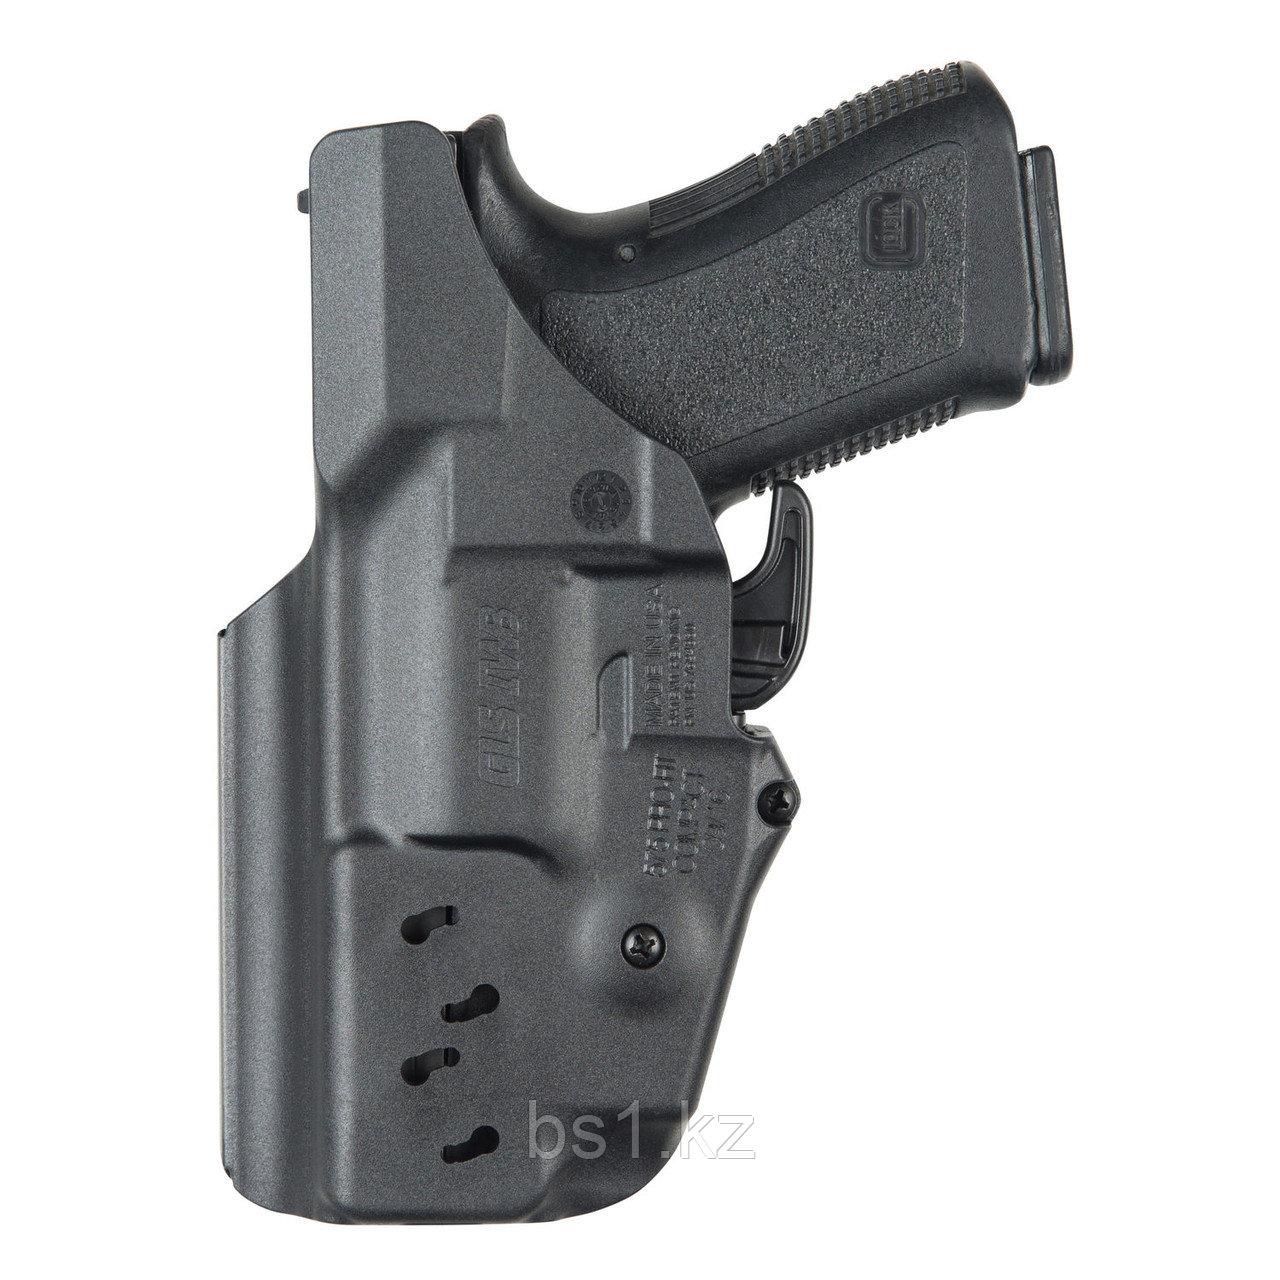 Пластиковая кобура Model 575 IWB GLS™ Pro-Fit Holster